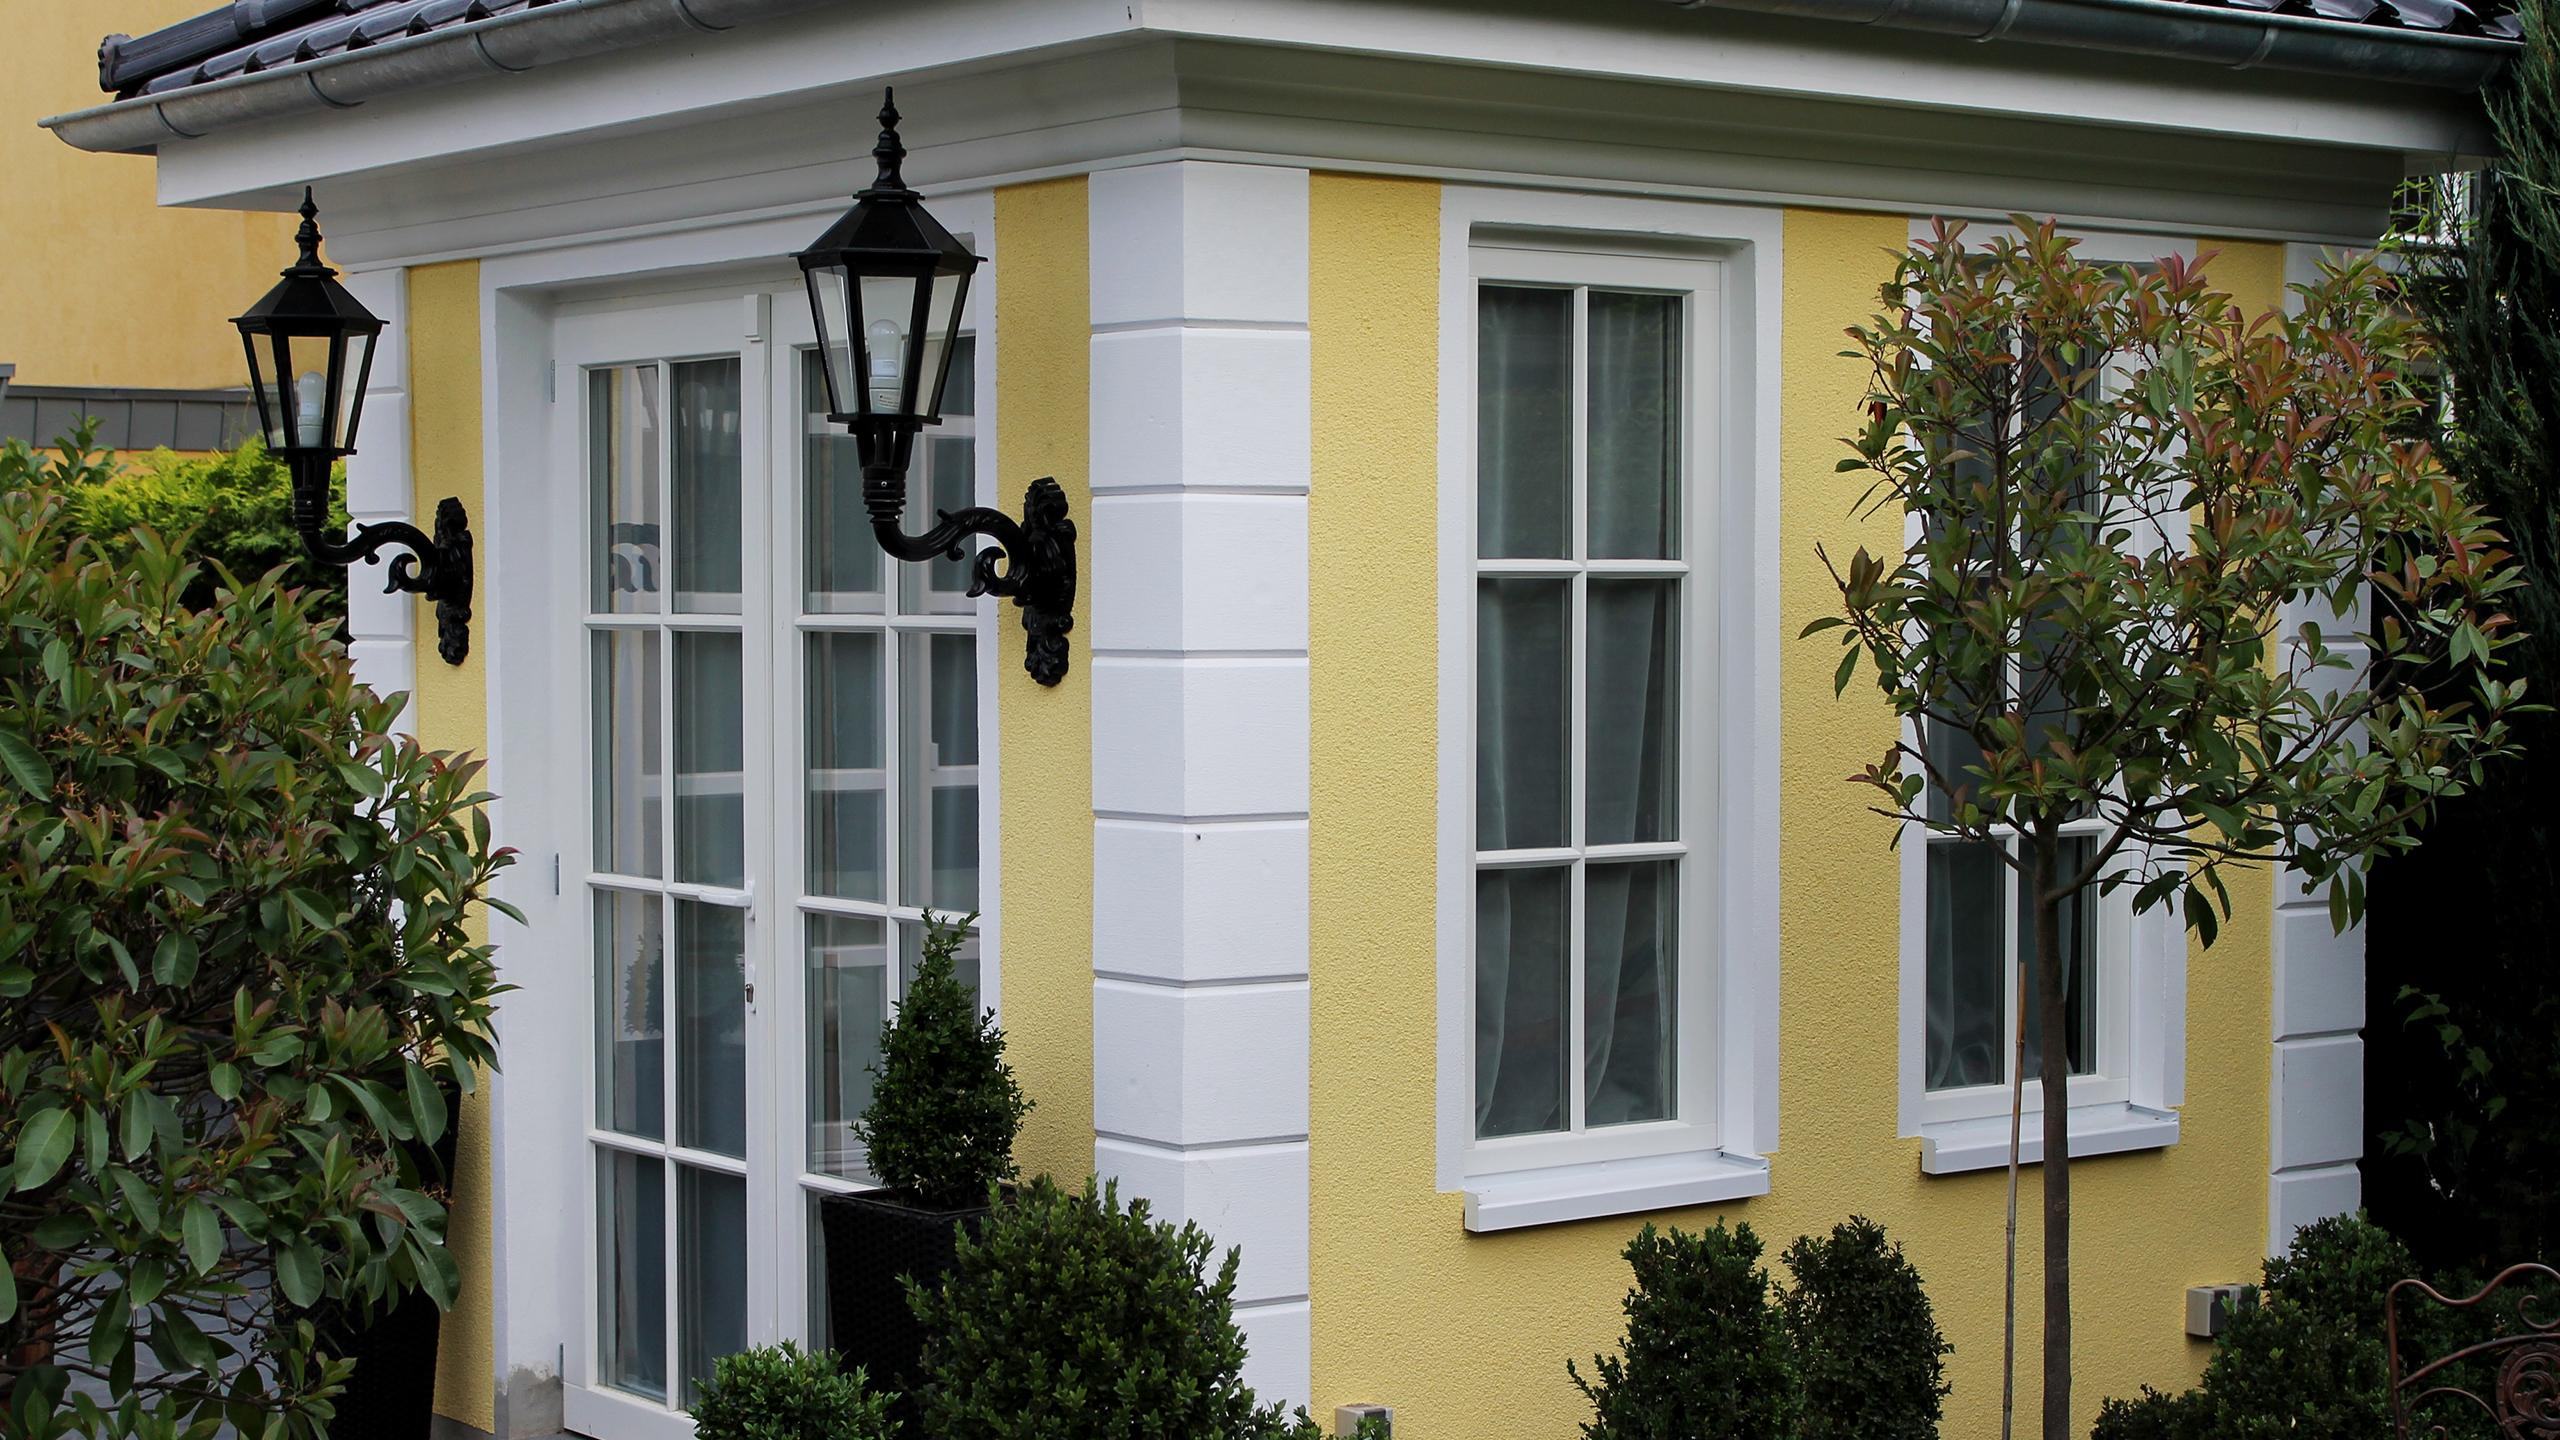 fassadenprofile und dekor f r die fassadengestaltung bendu. Black Bedroom Furniture Sets. Home Design Ideas